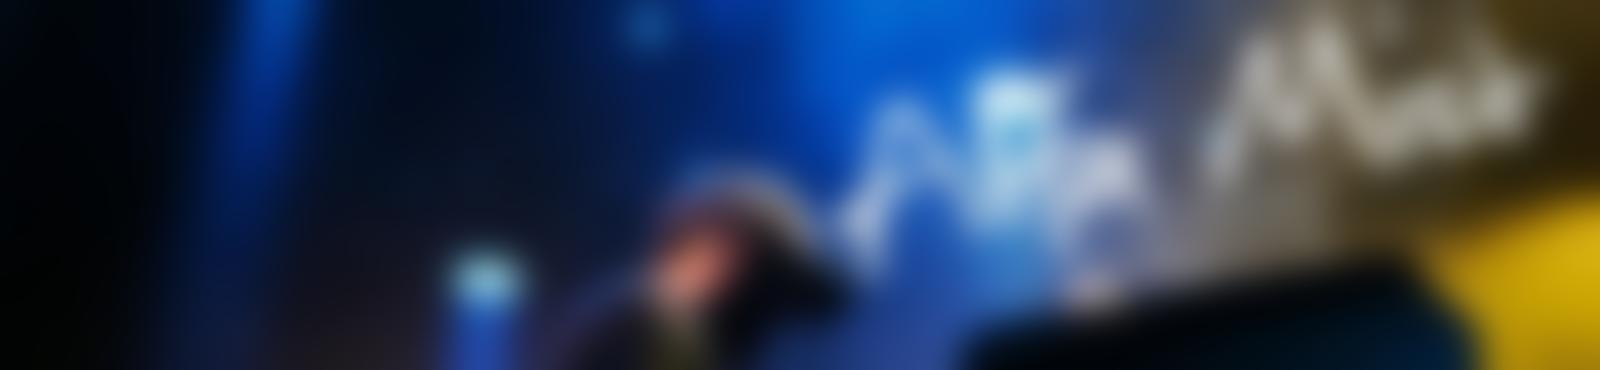 Blurred f923f24d bab2 40ce a1c6 60c9df5af8aa